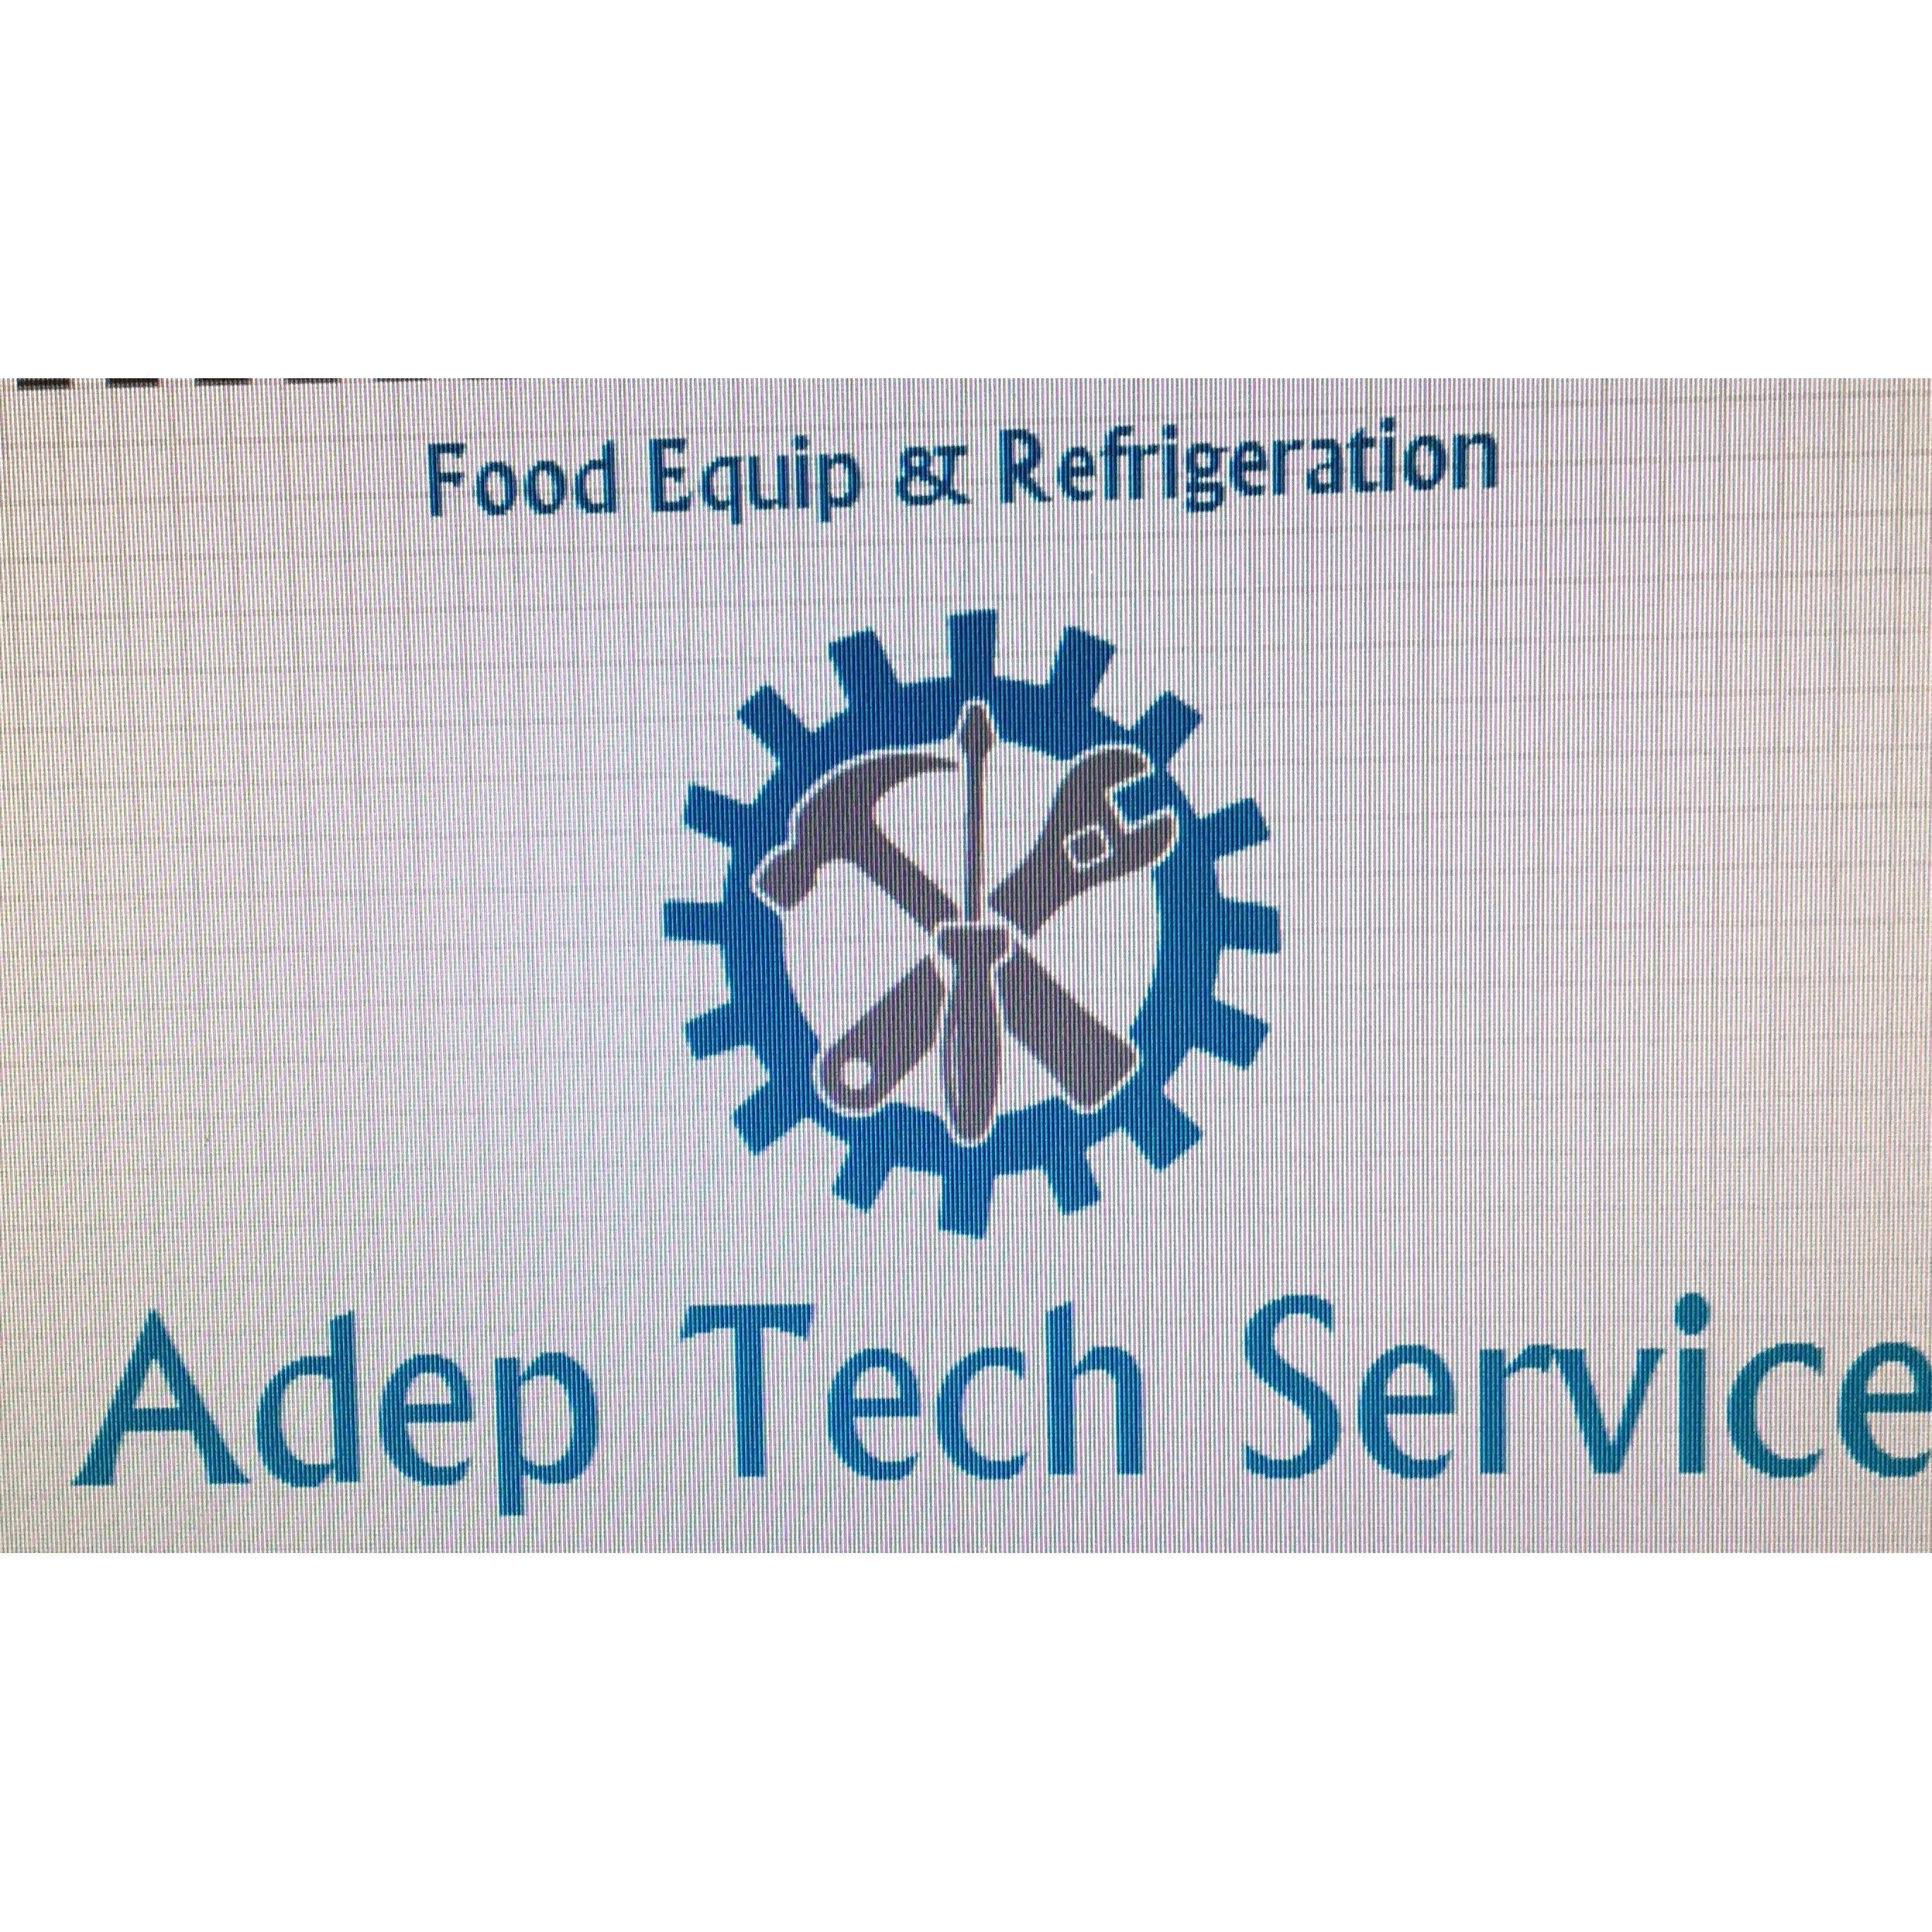 Adep Tech Service